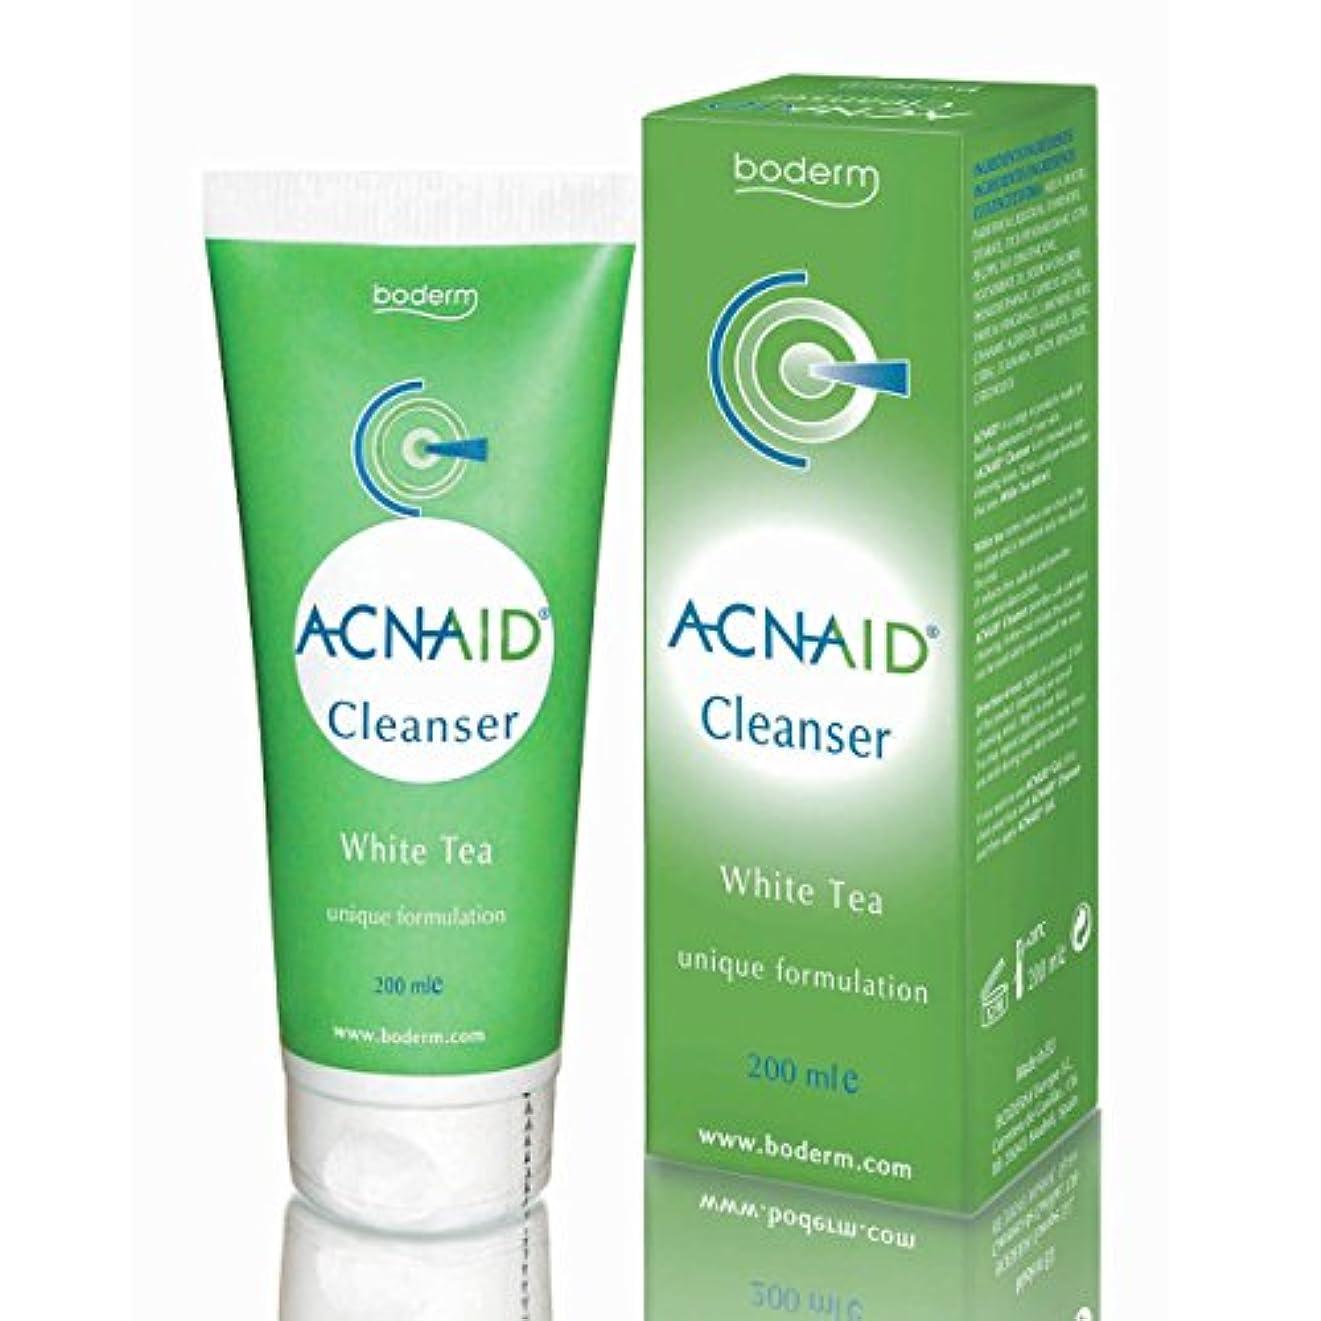 Acnaid Cleansing Lotion 200ml [並行輸入品]